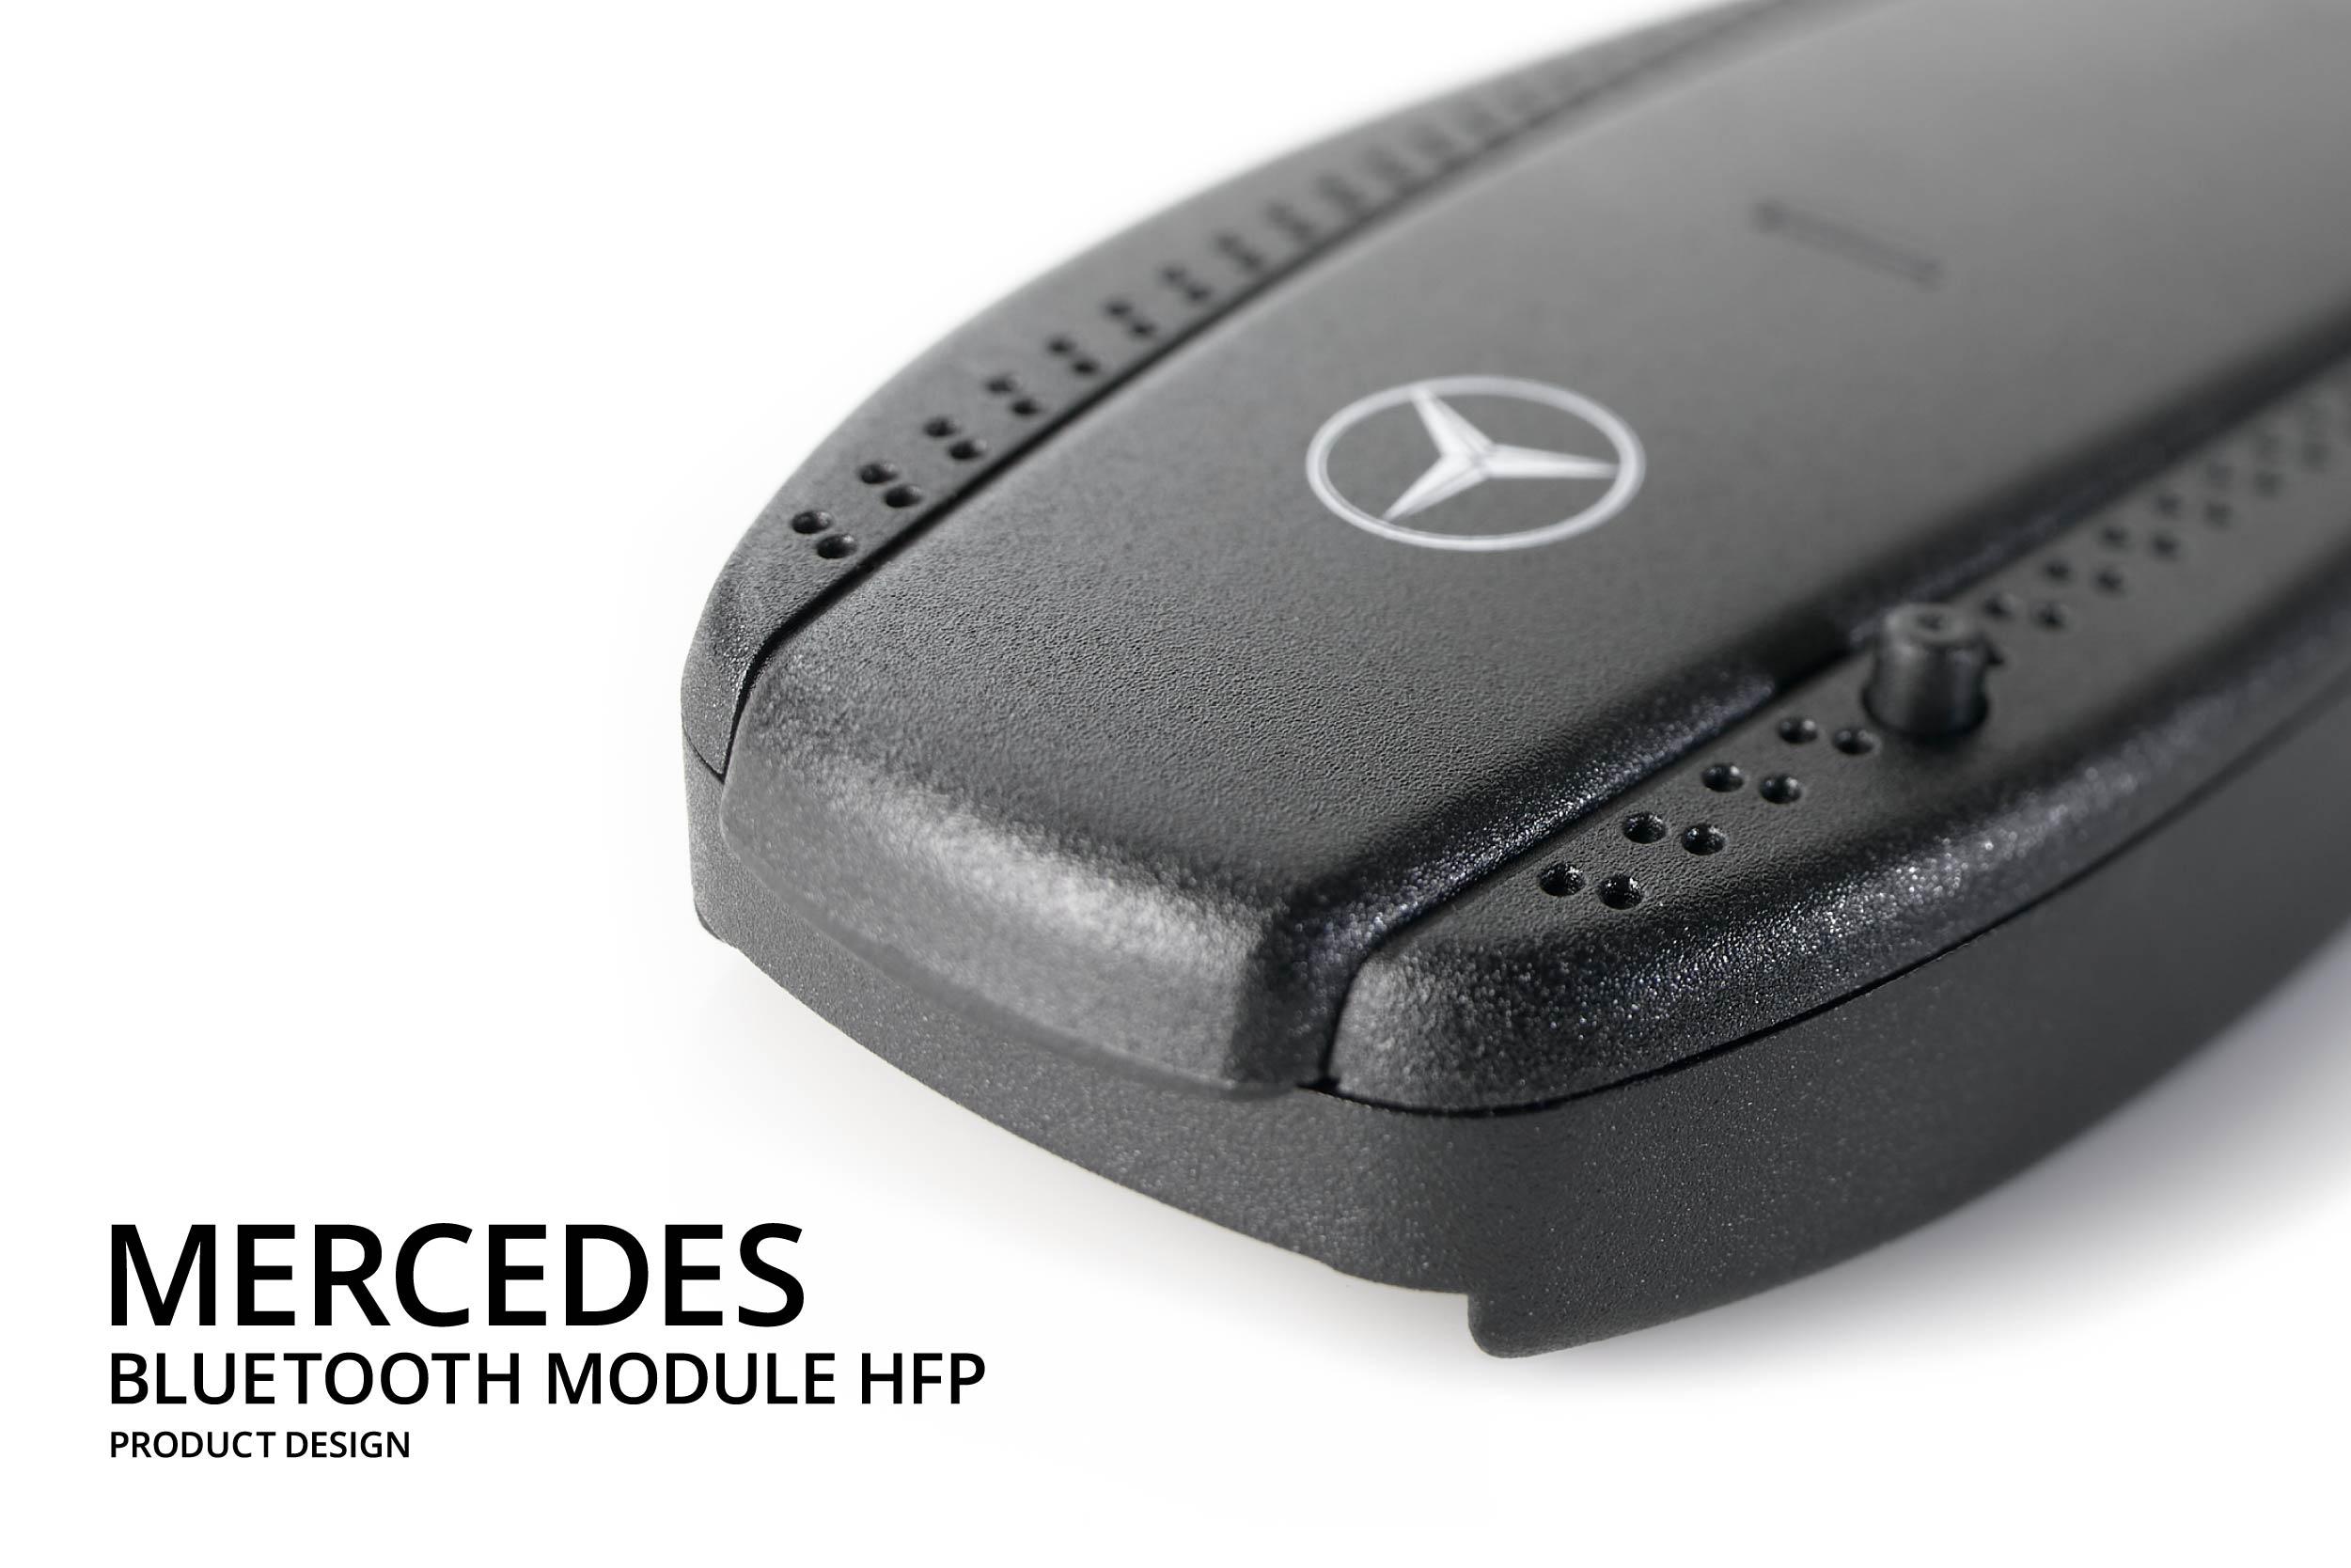 MB-BLUETOOTH-MODULE-HFP-1